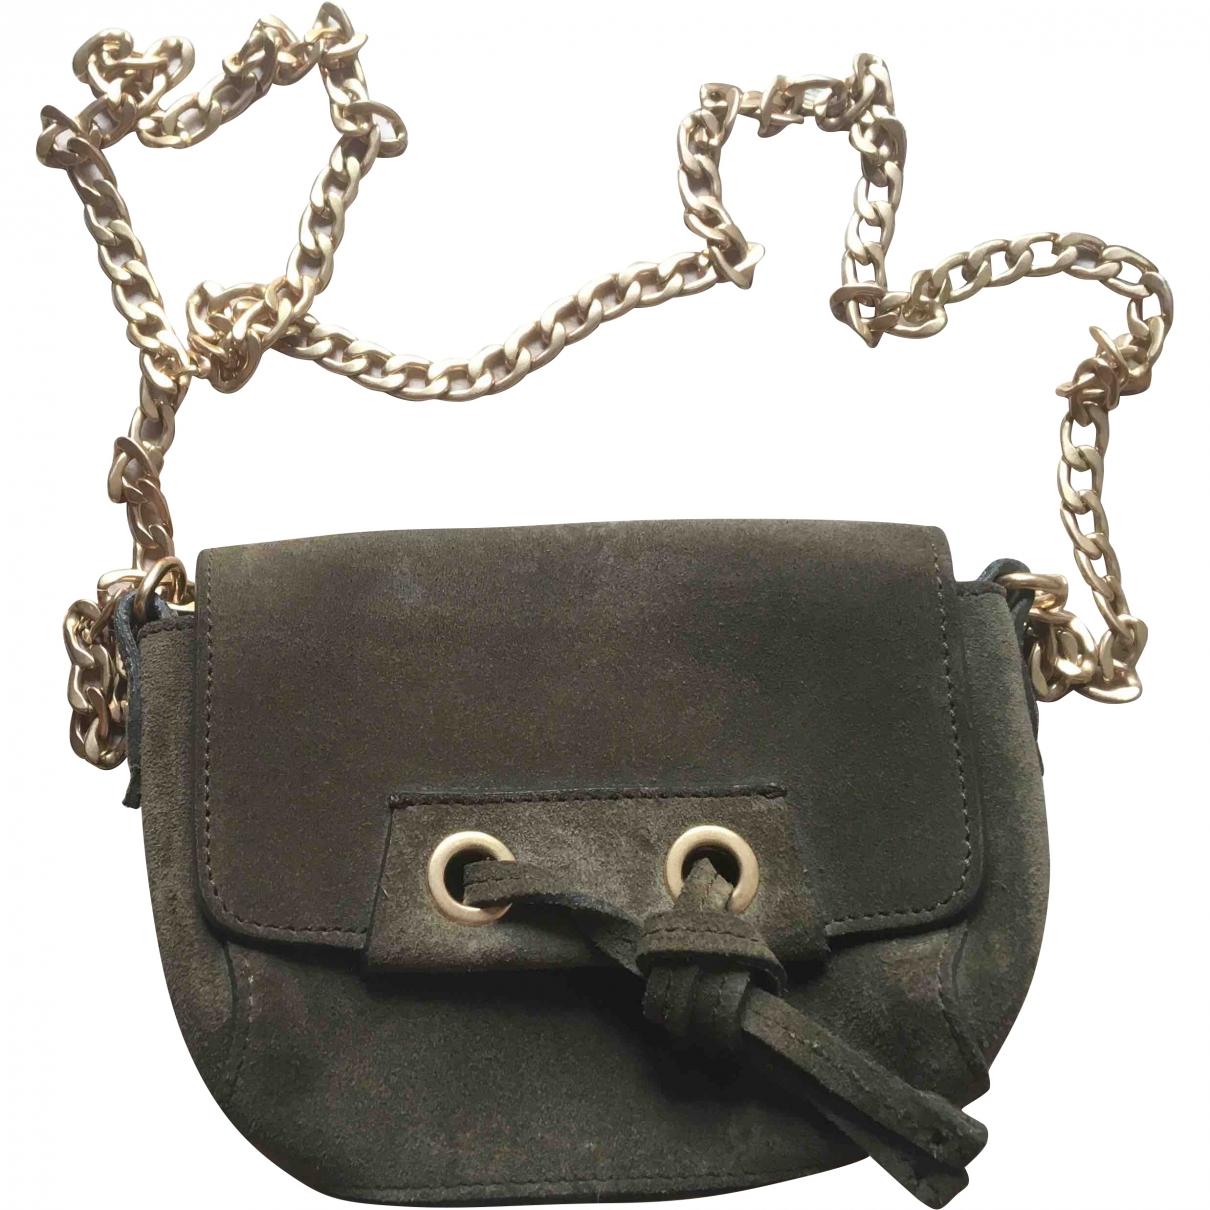 Vanessa Bruno \N Green Leather handbag for Women \N